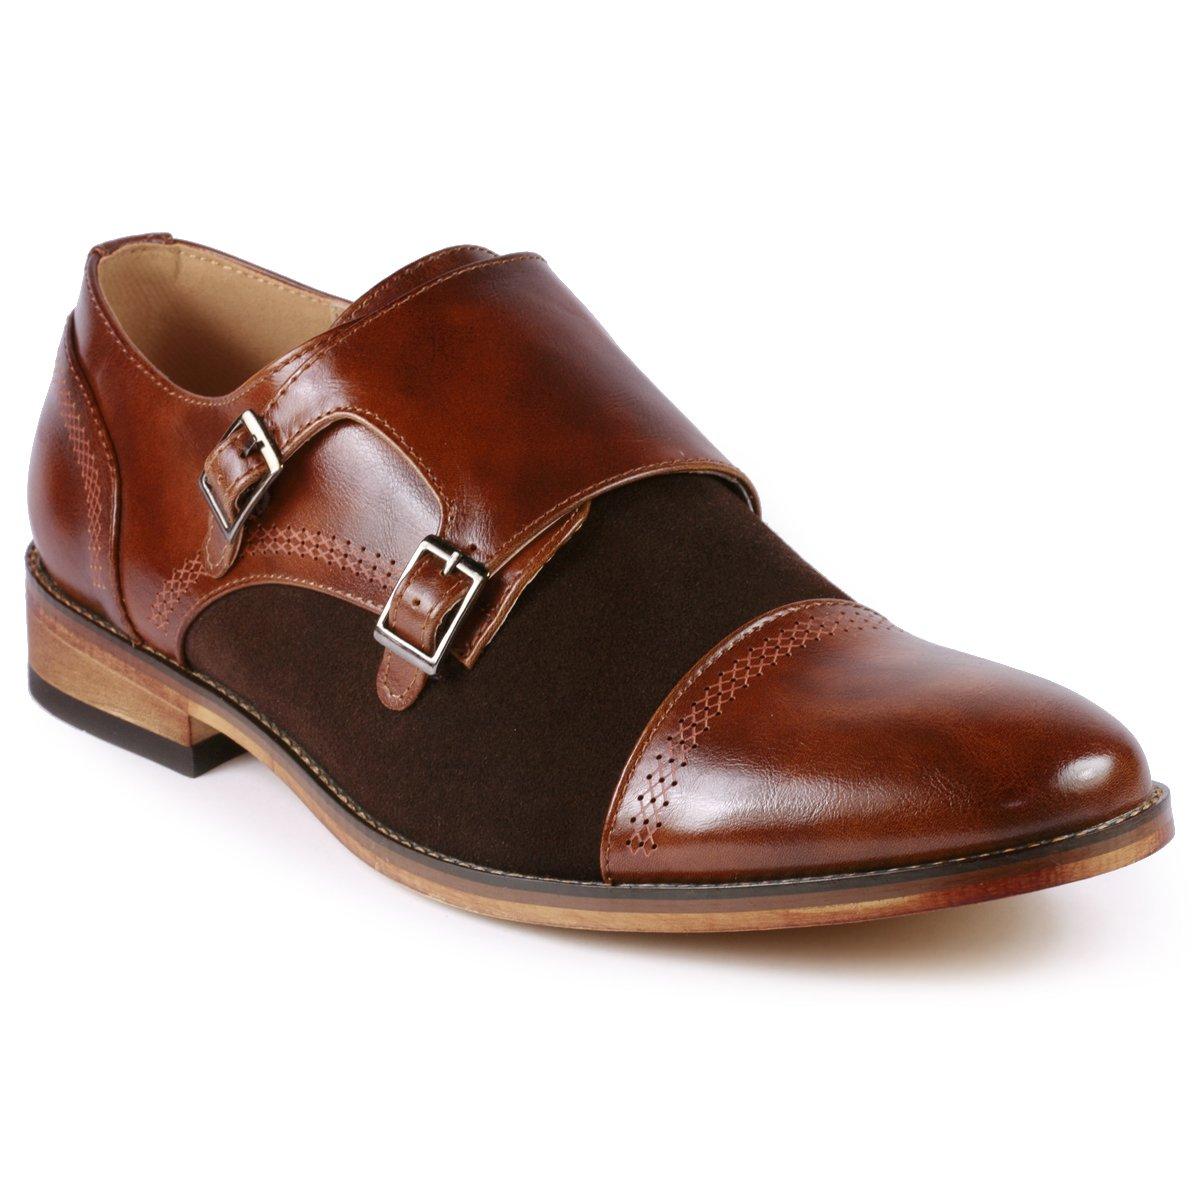 Metrocharm MC135 Men's Double Monk Strap Cap Toe Slip On Oxford Dress Shoes (13 D(M) US, Brown)